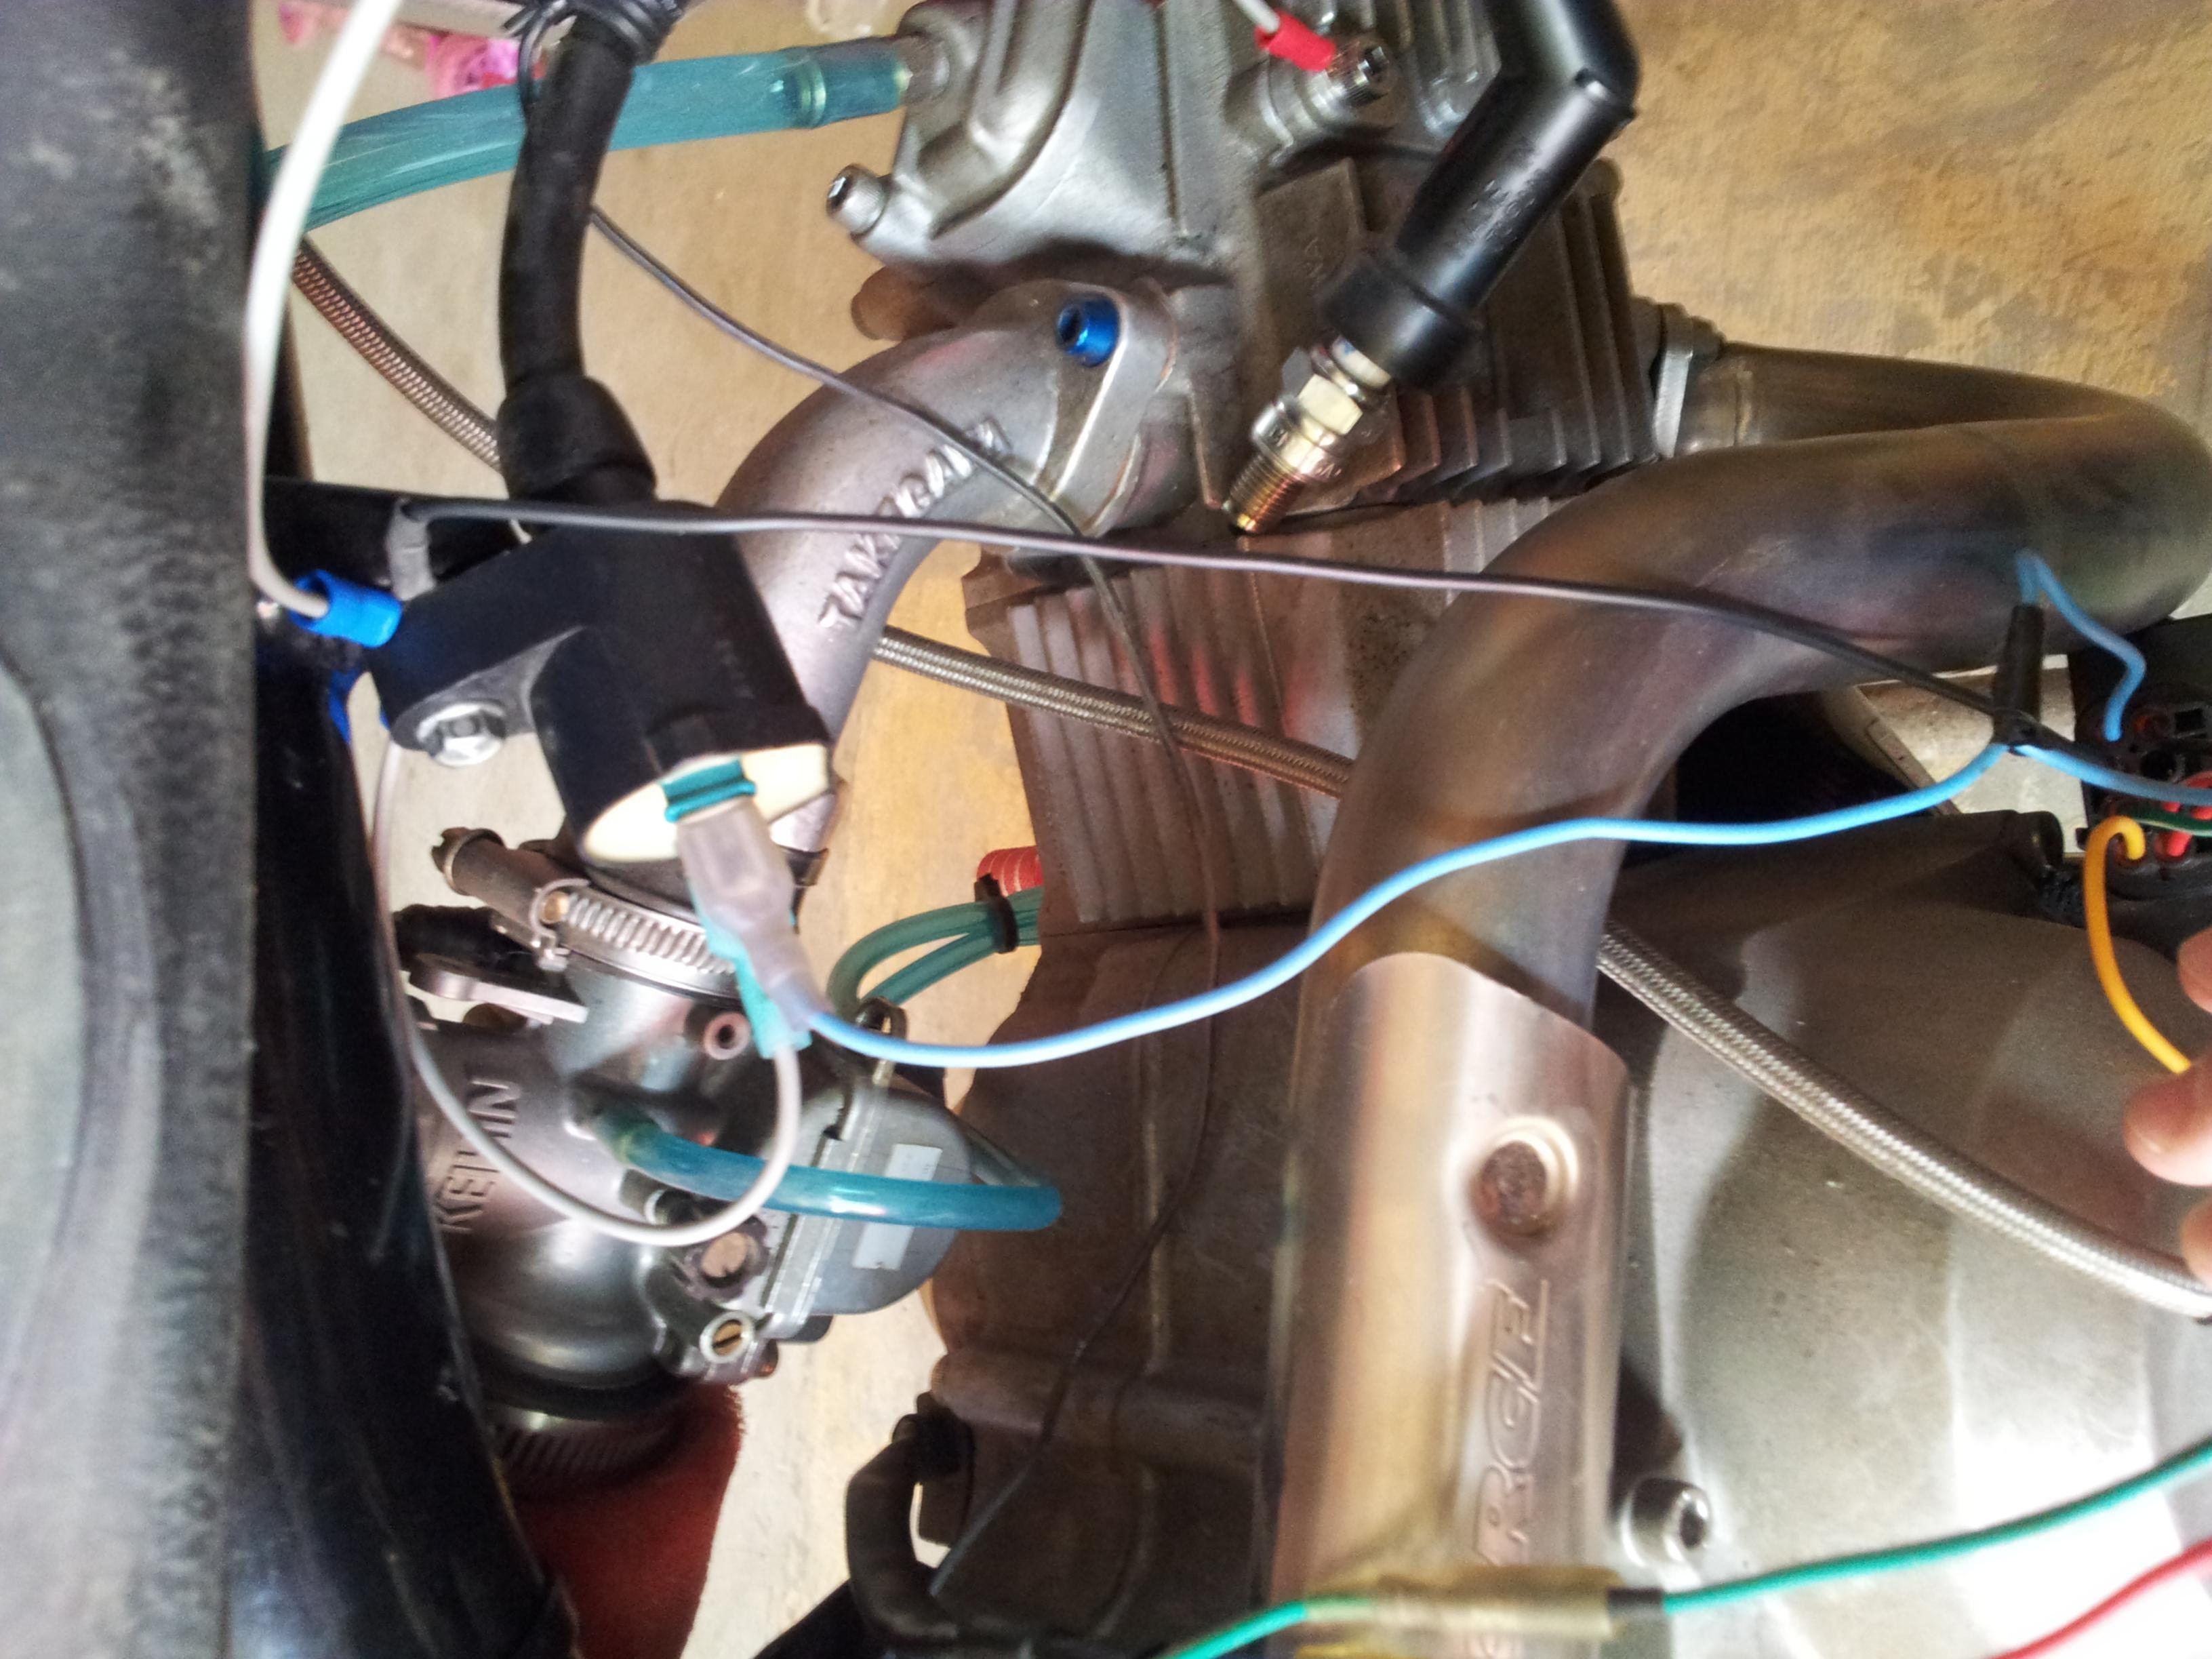 Honda Xr50r Wiring Diagram | social-connection Wiring Diagram Number -  social-connection.garbobar.itGarbo Bar